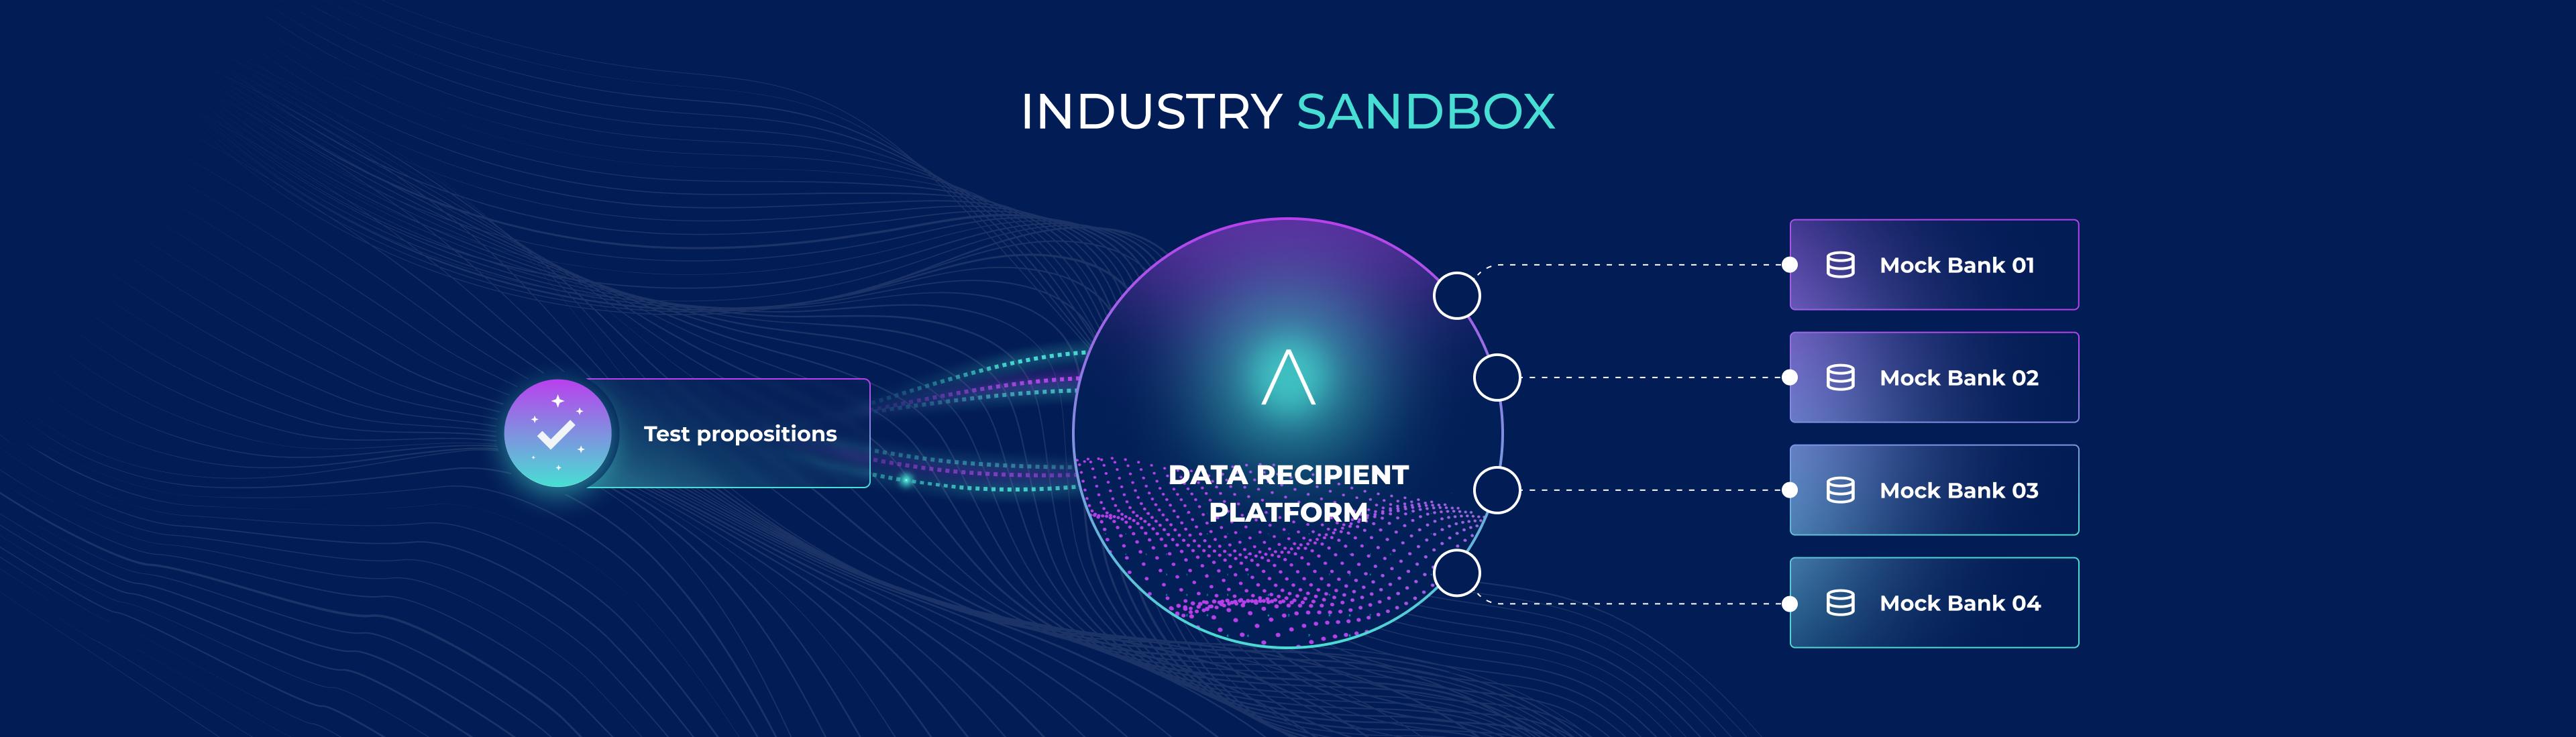 adatree-industry-sandbox